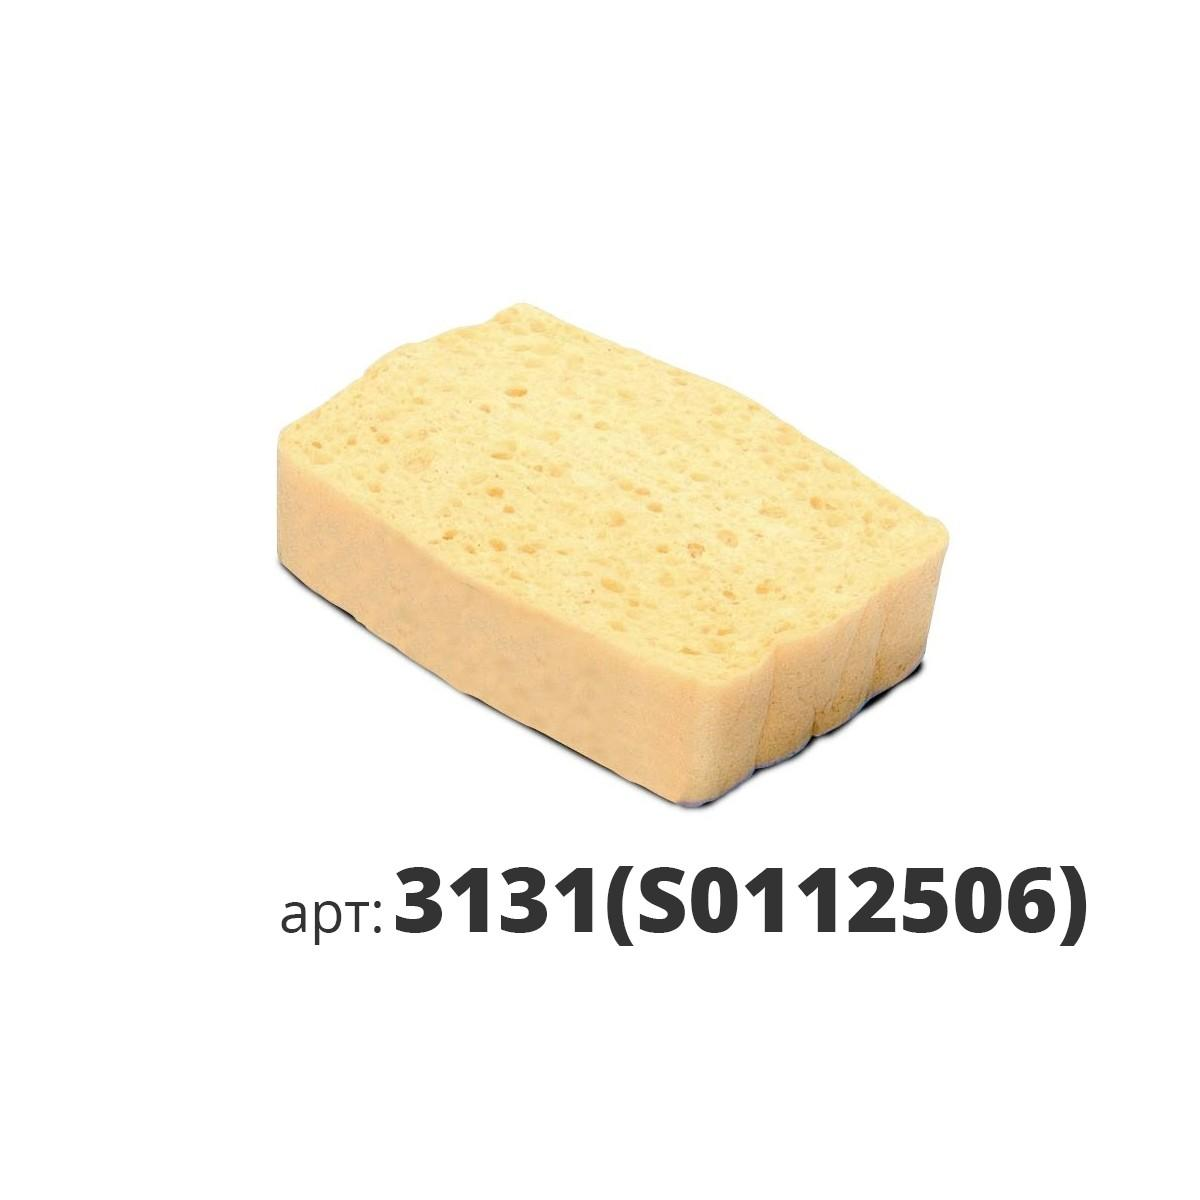 PAVAN губка декоративная целлюлозная 3131(S0112506)